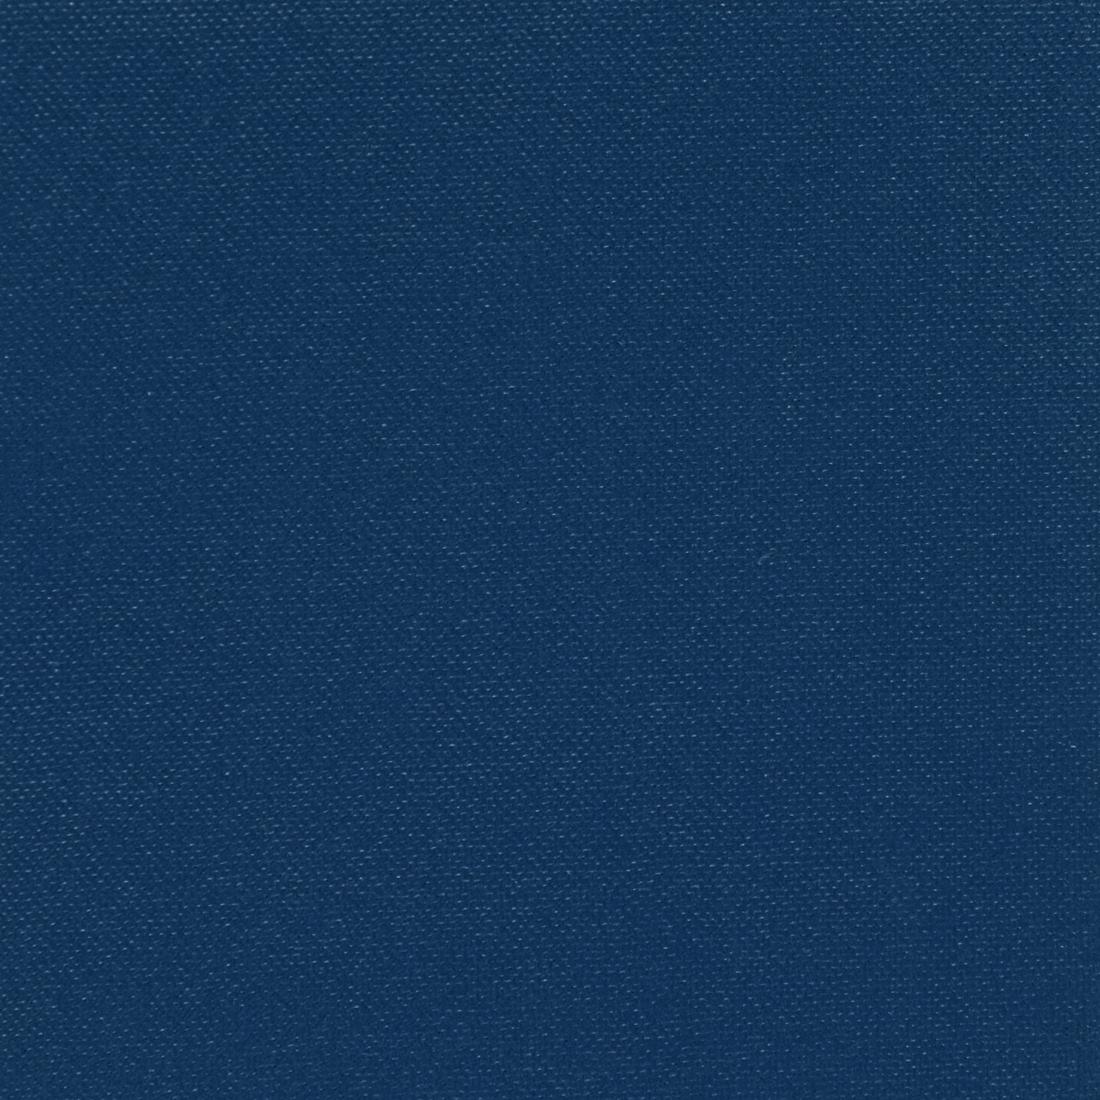 320_018B_Kobaltblau